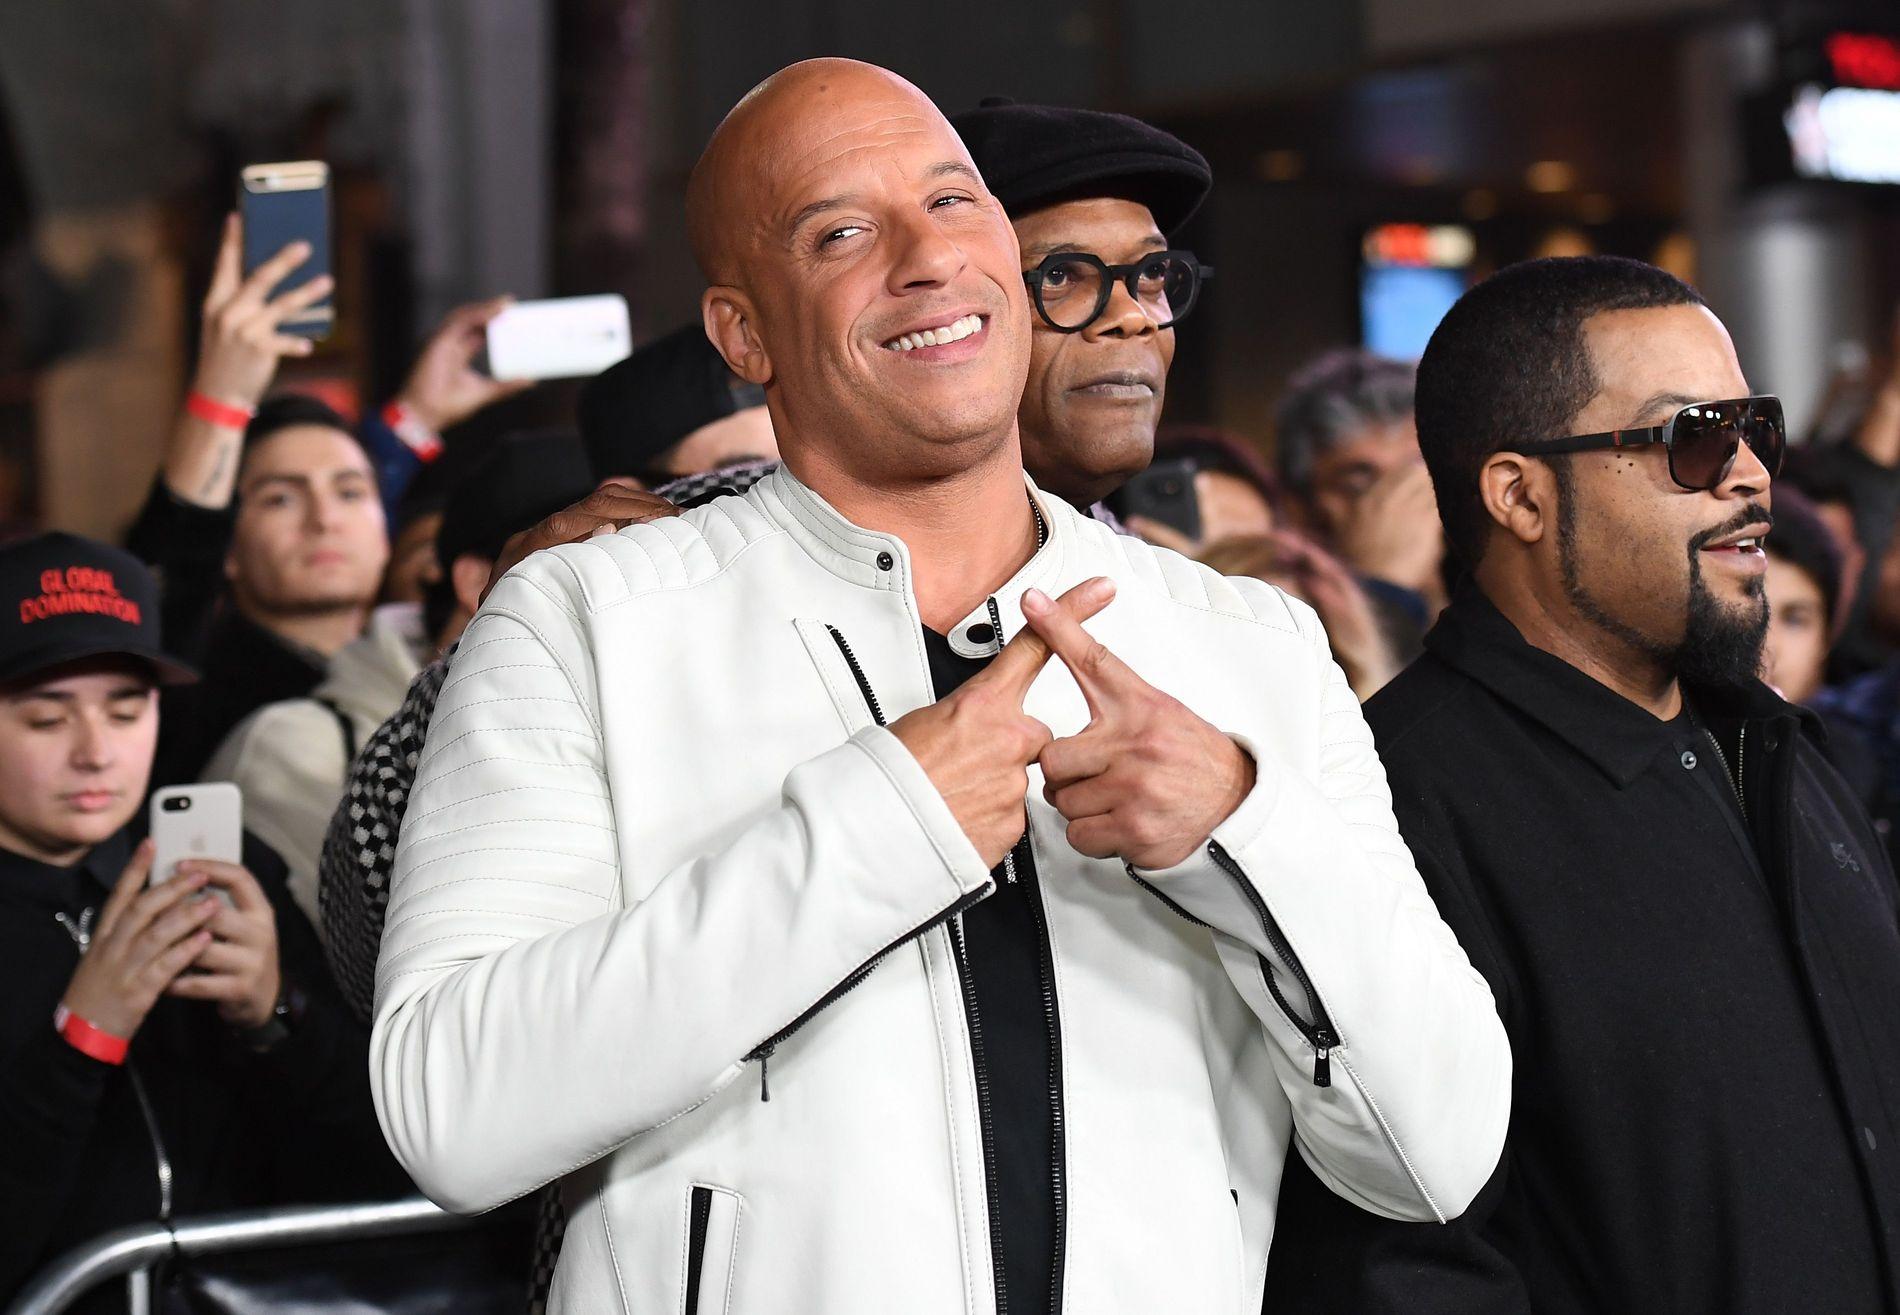 MAGISK: Filmstjernen Vin Diesel kaller norske Kygo for magisk både på Facebook og Instagram og legger ikke skjul på at han er svært begeistret.